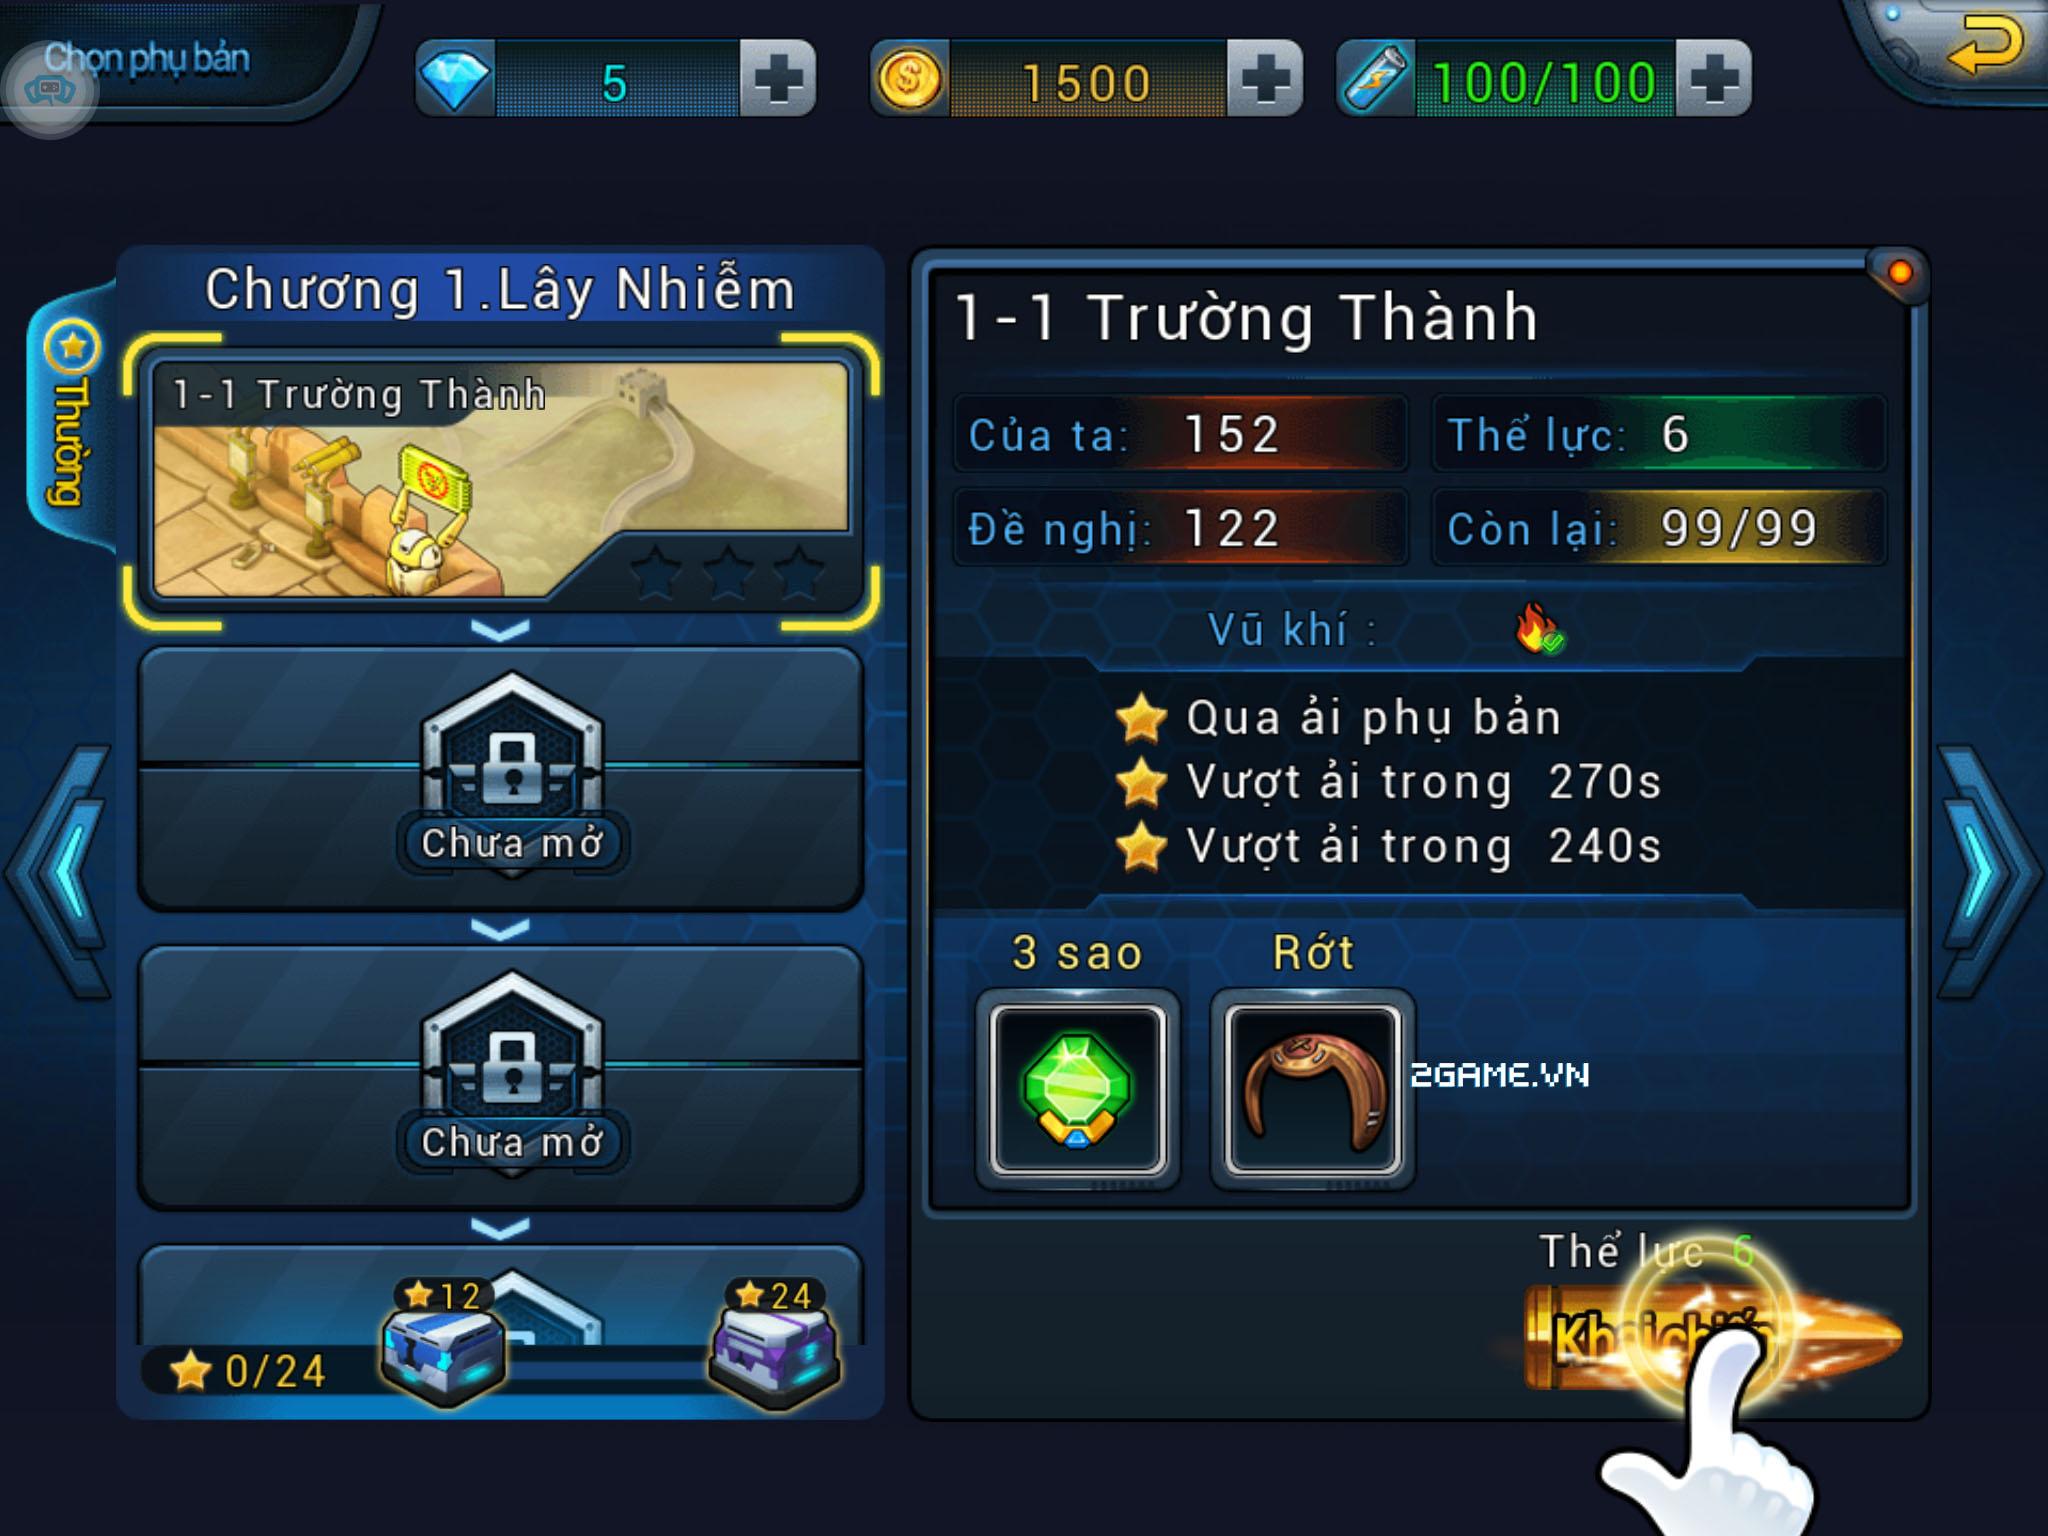 2game_trai_nghiem_avengers_huyen_thoai_vh_2.jpg (2048×1536)